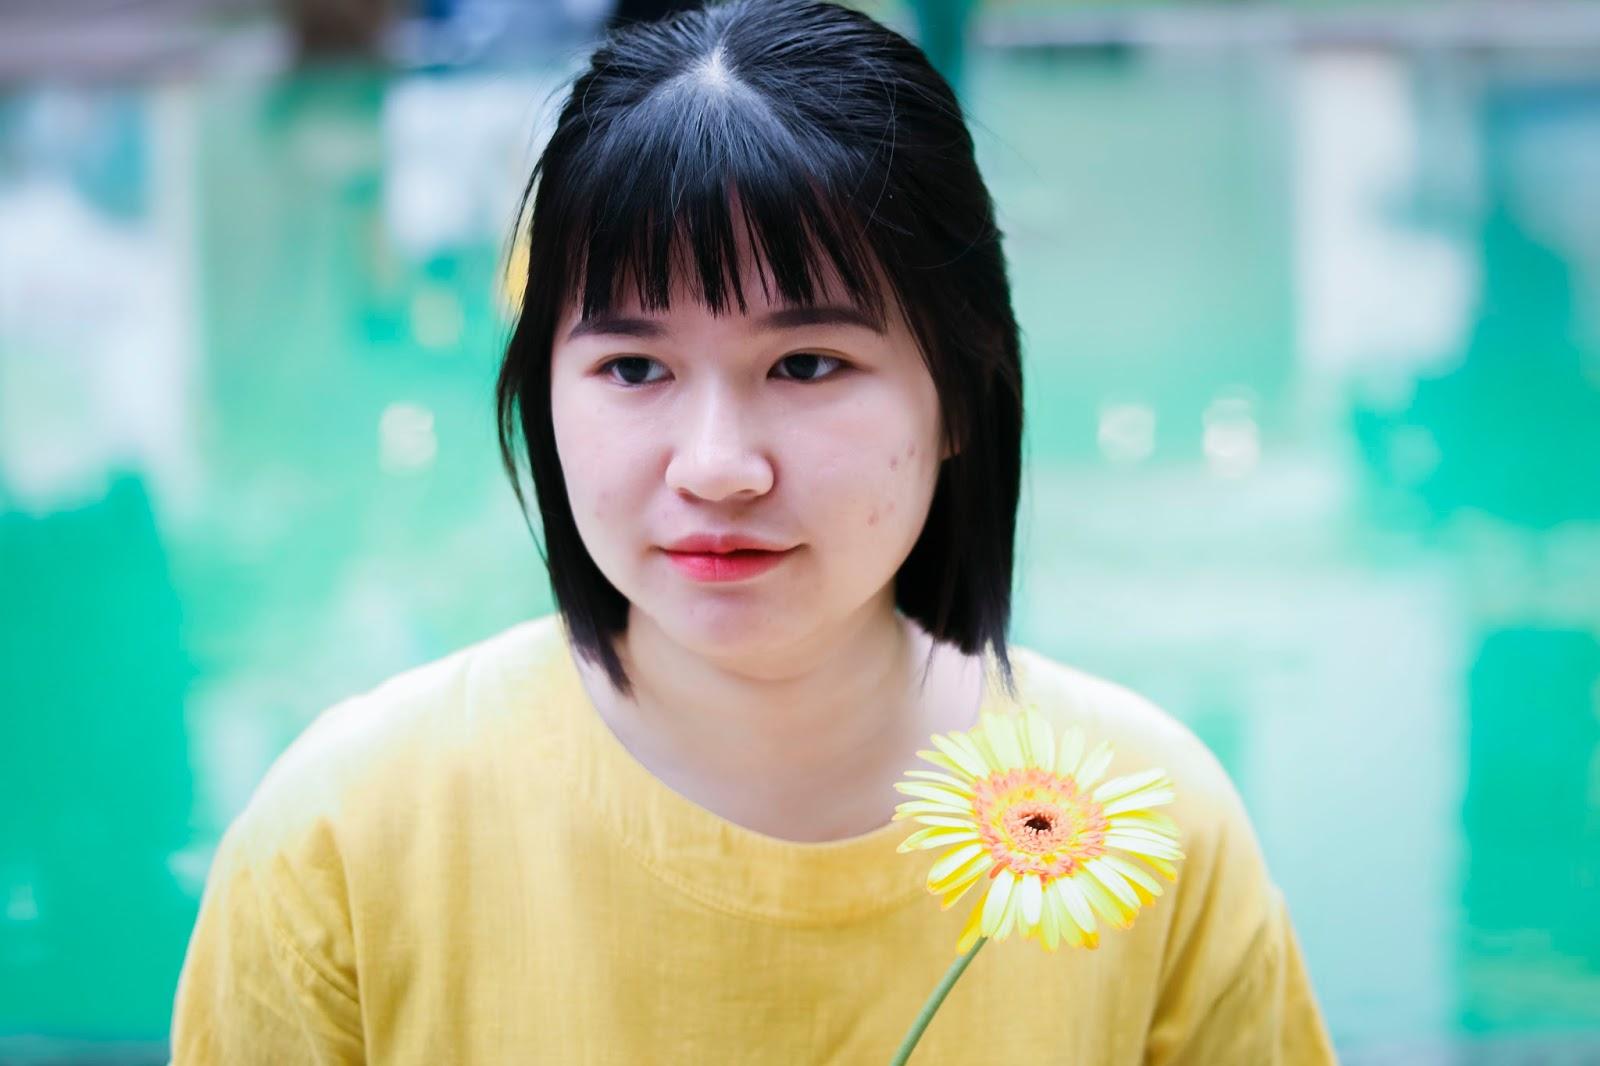 Ms. Giang